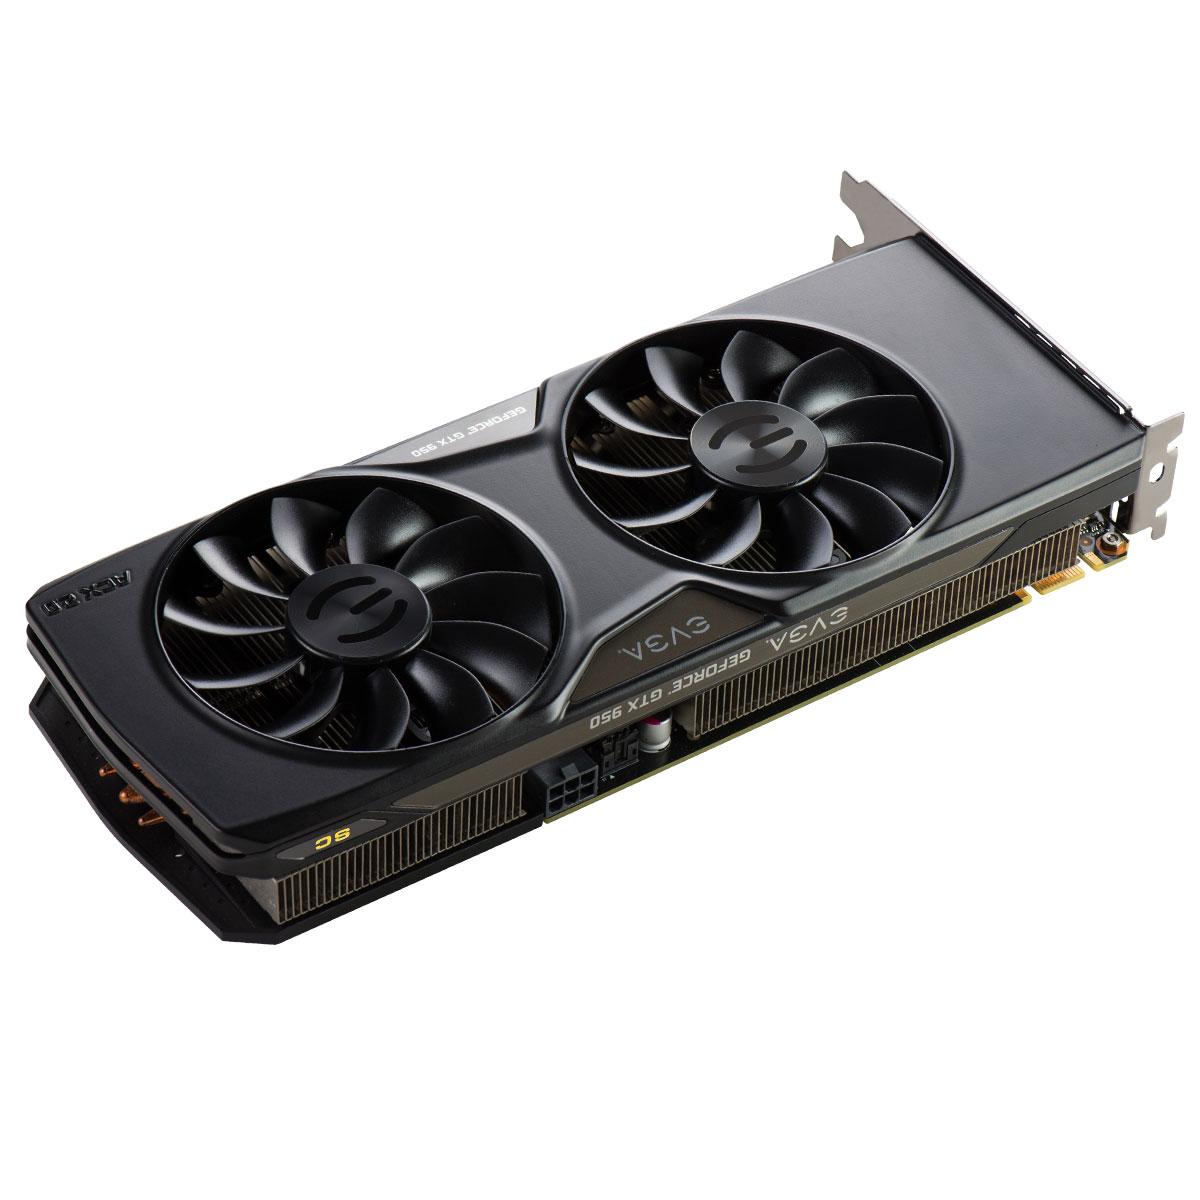 Placa de Vídeo Geforce GTX950 2GB SC Gaming ACX2.0 DDR5 128Bits 02G-P4-2956-KR - EVGA